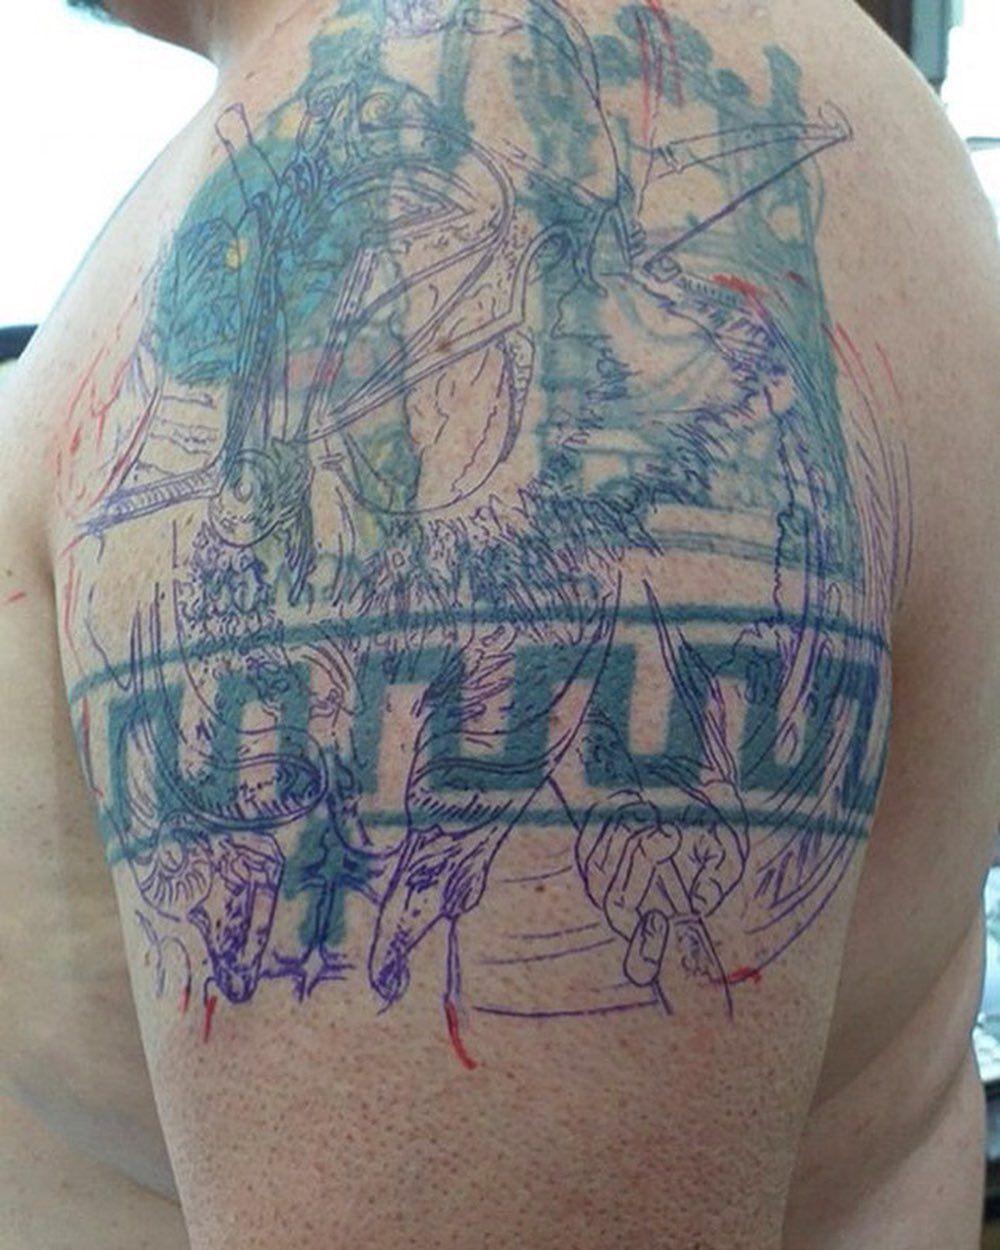 So serious . #tattoo #tattoos #tattoorealism #tattoothailand #inked #tattoopattaya #artist #drawing #fusion_in...  So serious . #tattoo #tattoos #tattoorealism #tattoothailand #inked #tattoopattaya #artist #drawing #fusion_ink #blackandgraytattoos #300 #spartantattoo #thailandtattoo